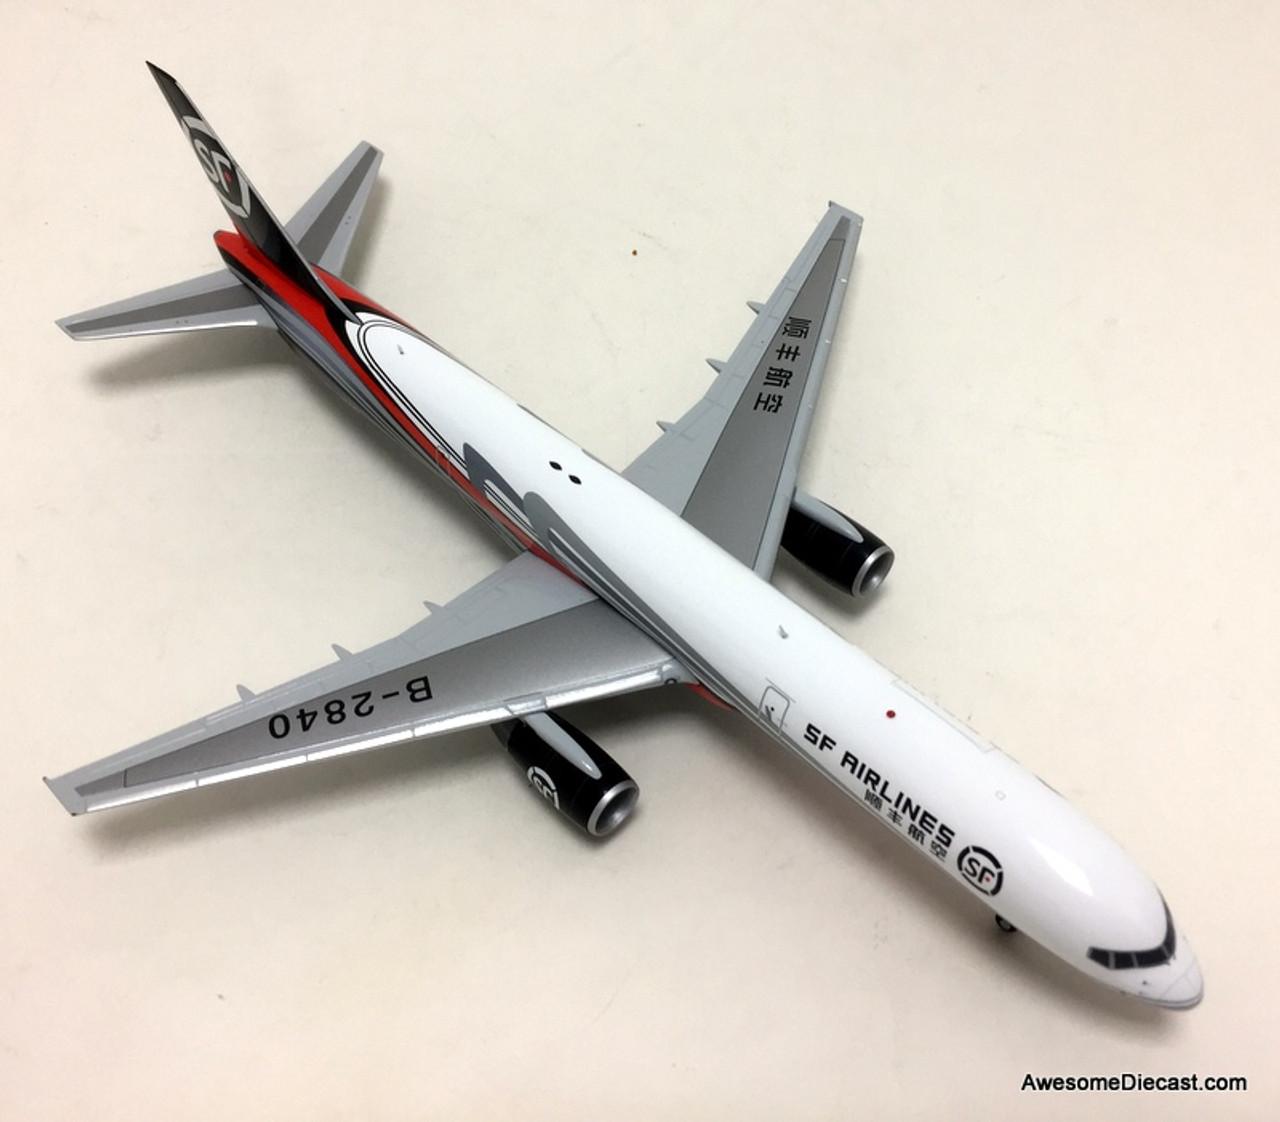 Gemini 200 1:200 Boeing 757-200F: SF Airlines, Cargo Plane